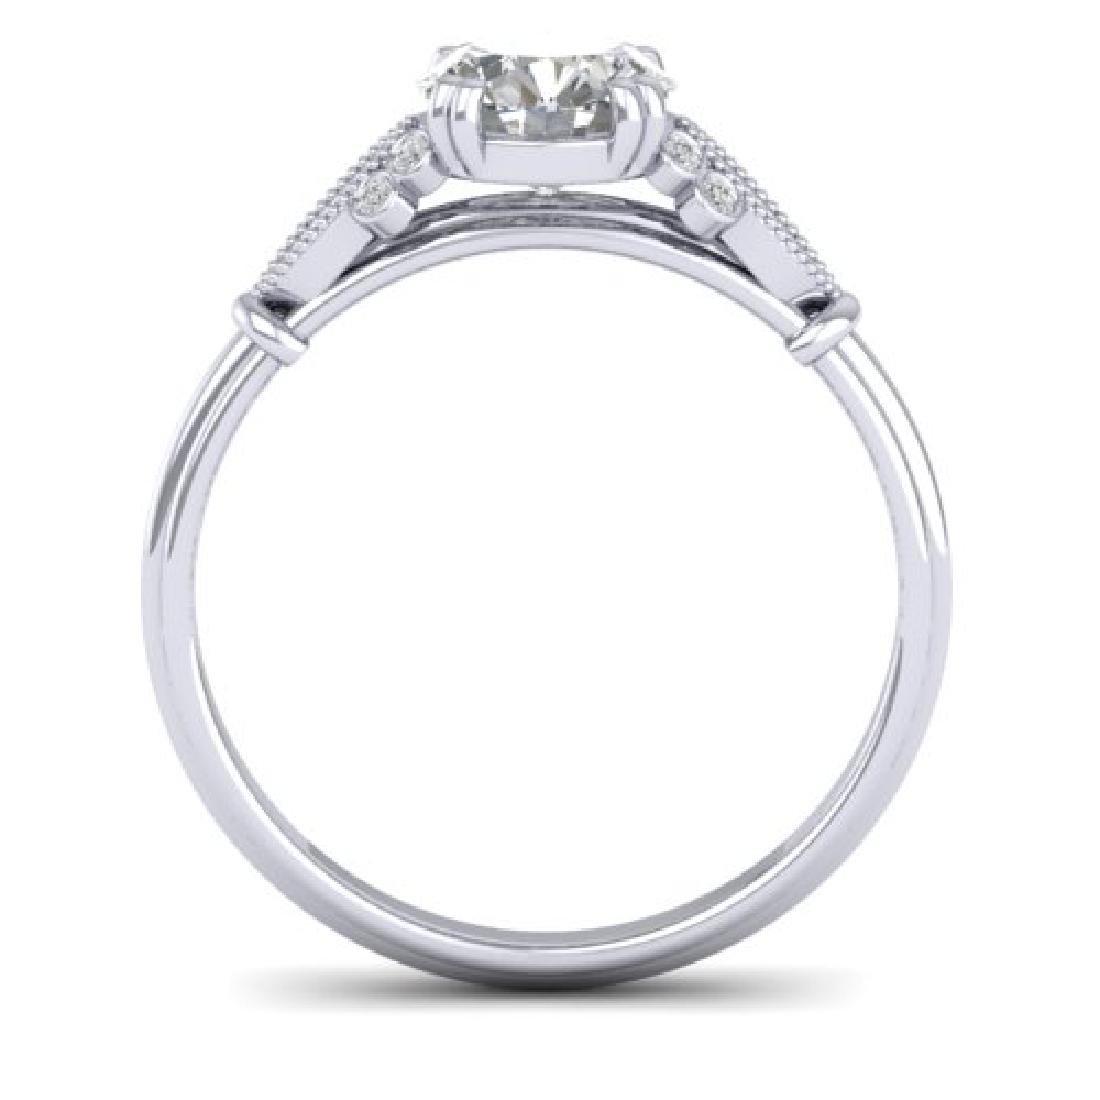 1.15 CTW Certified VS/SI Diamond Solitaire Art Deco - 3